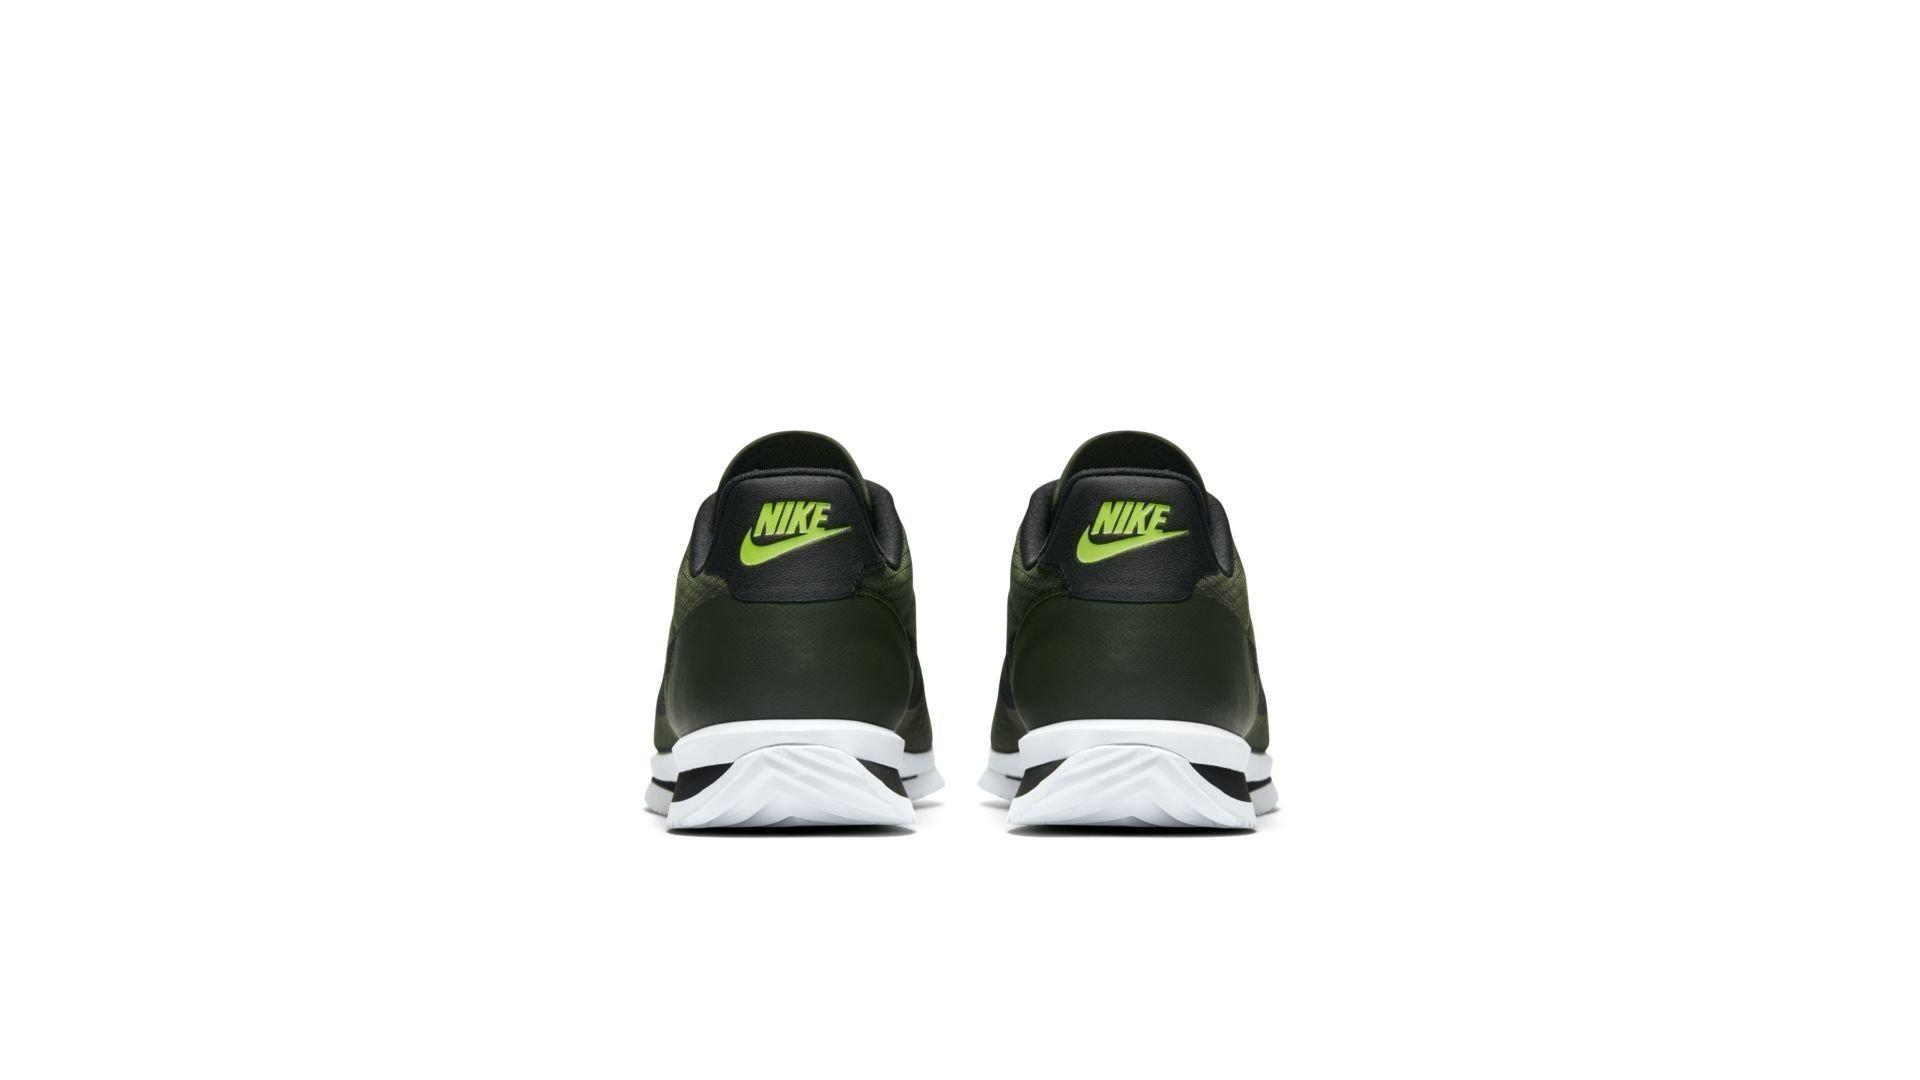 Nike Cortez Ultra Cargo Khaki Black (833142-300)